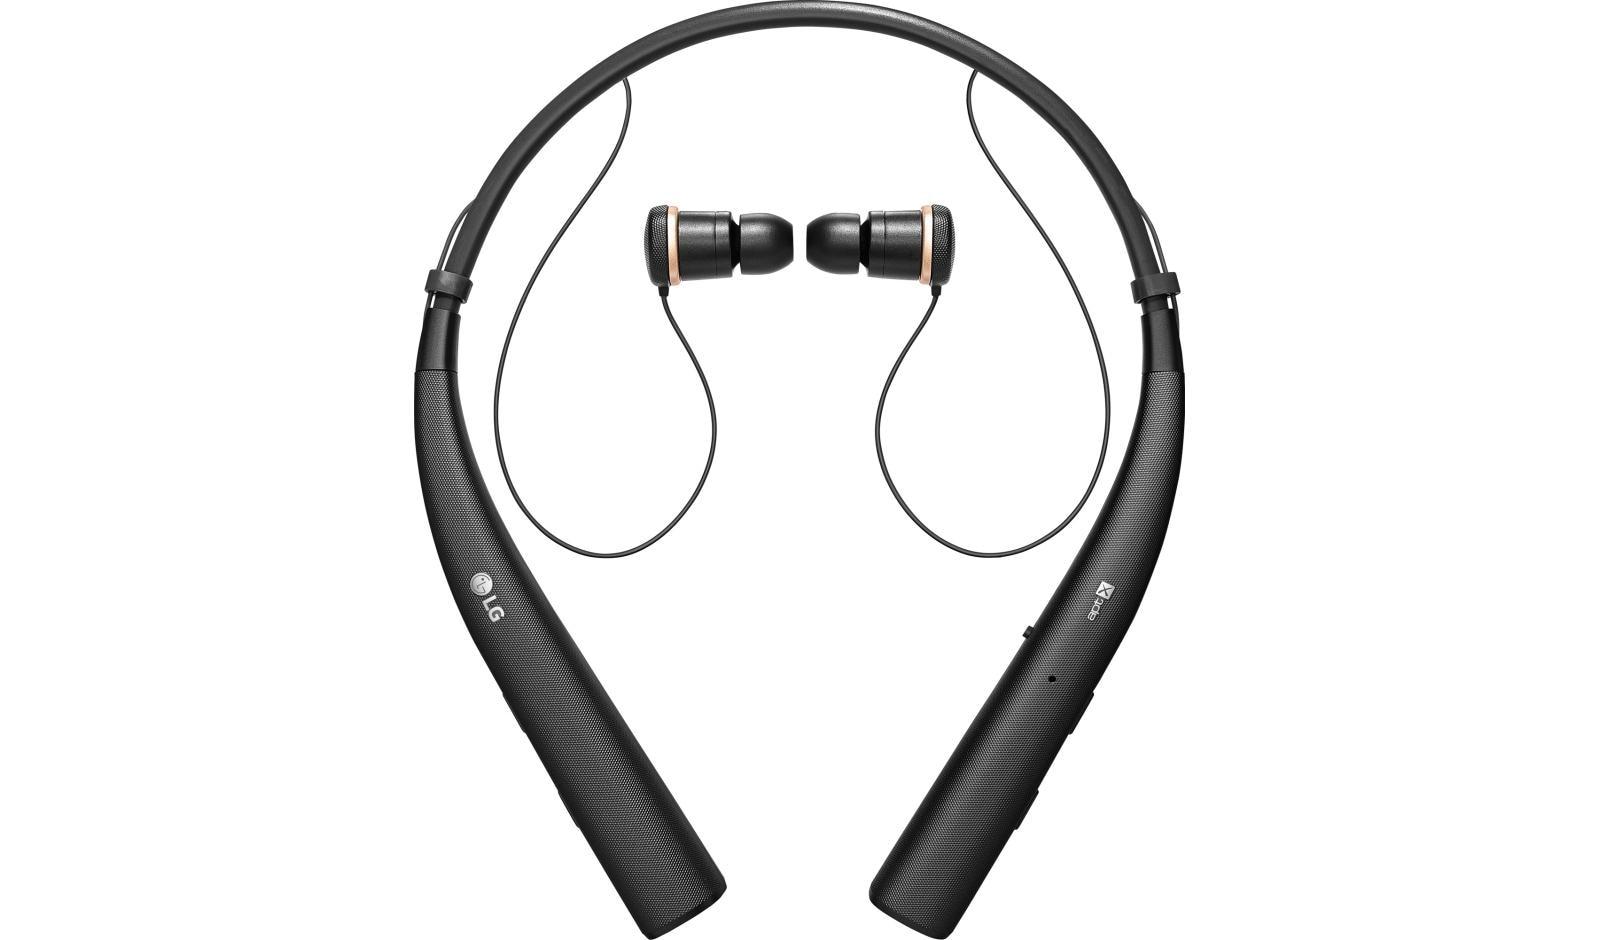 Lg Tone Pro Bluetooth Wireless Headset In Black Usa Wiring Jog Control